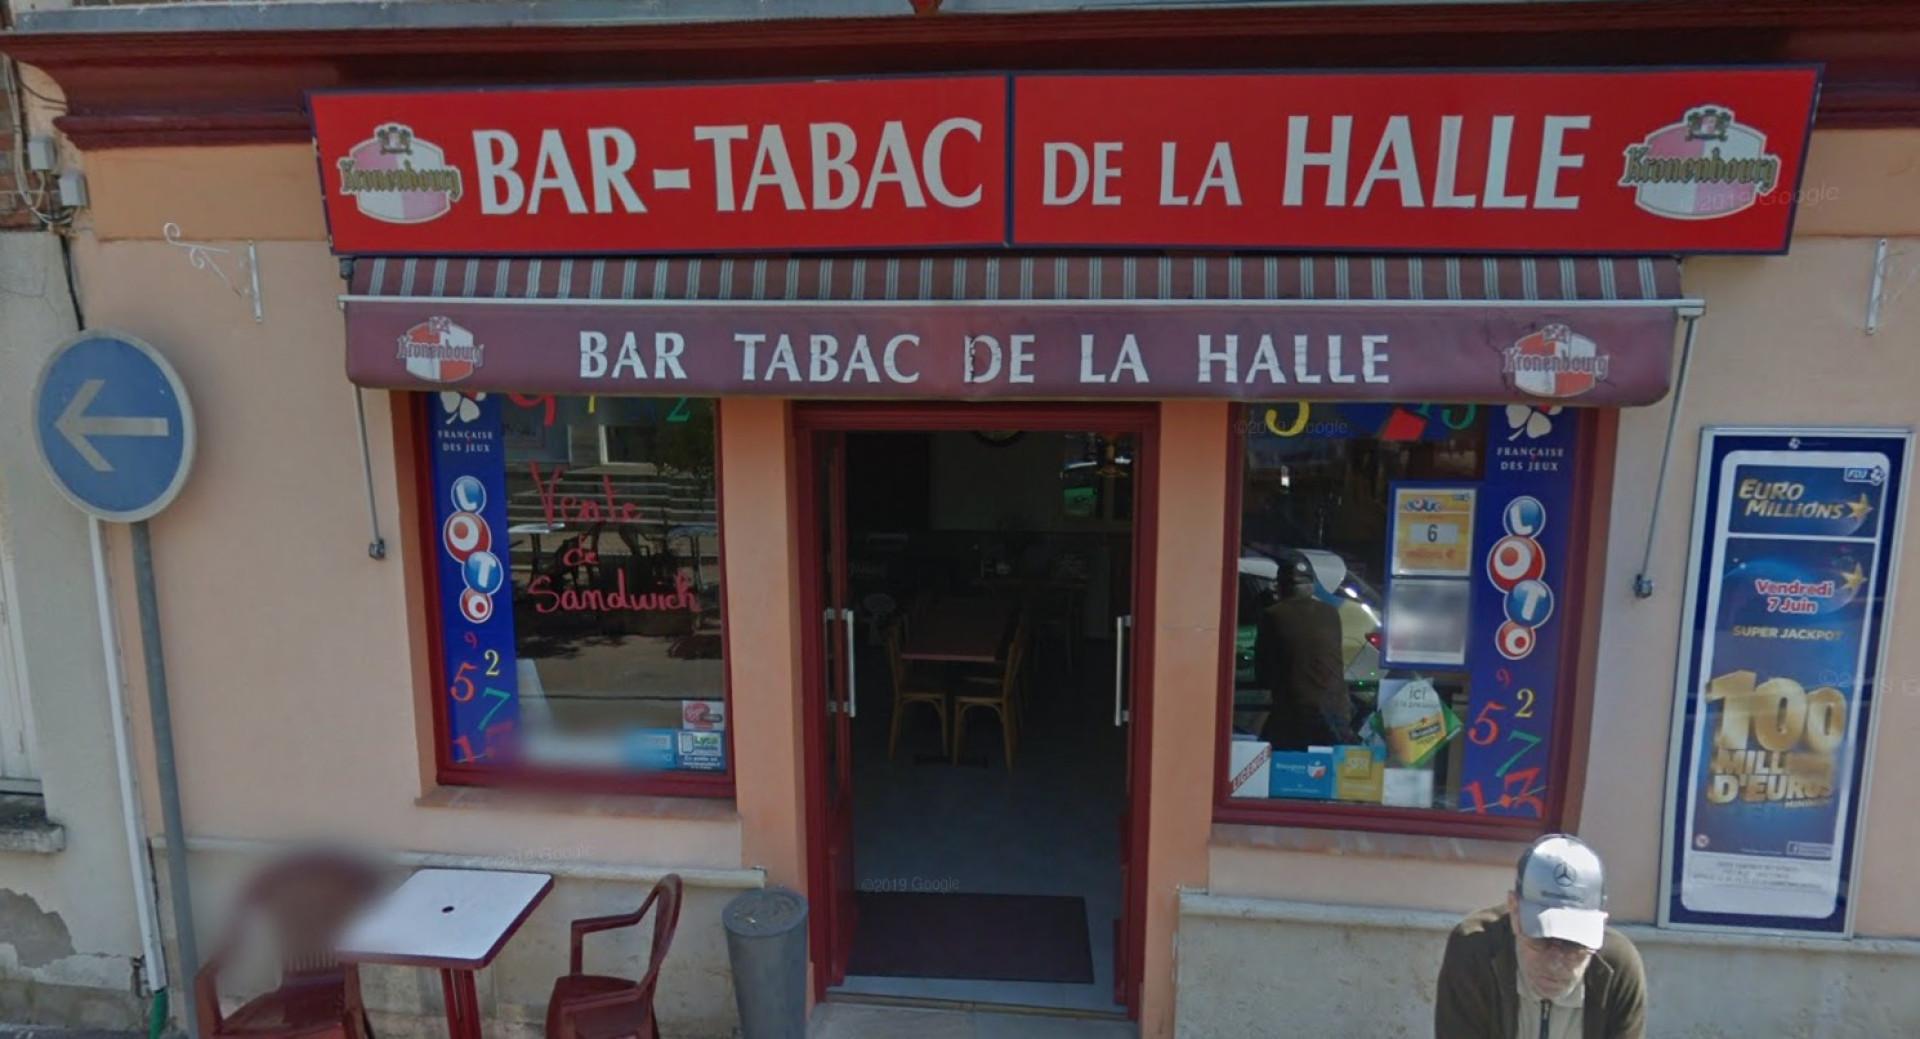 Bar Tabac Loto FDJ Champignelles